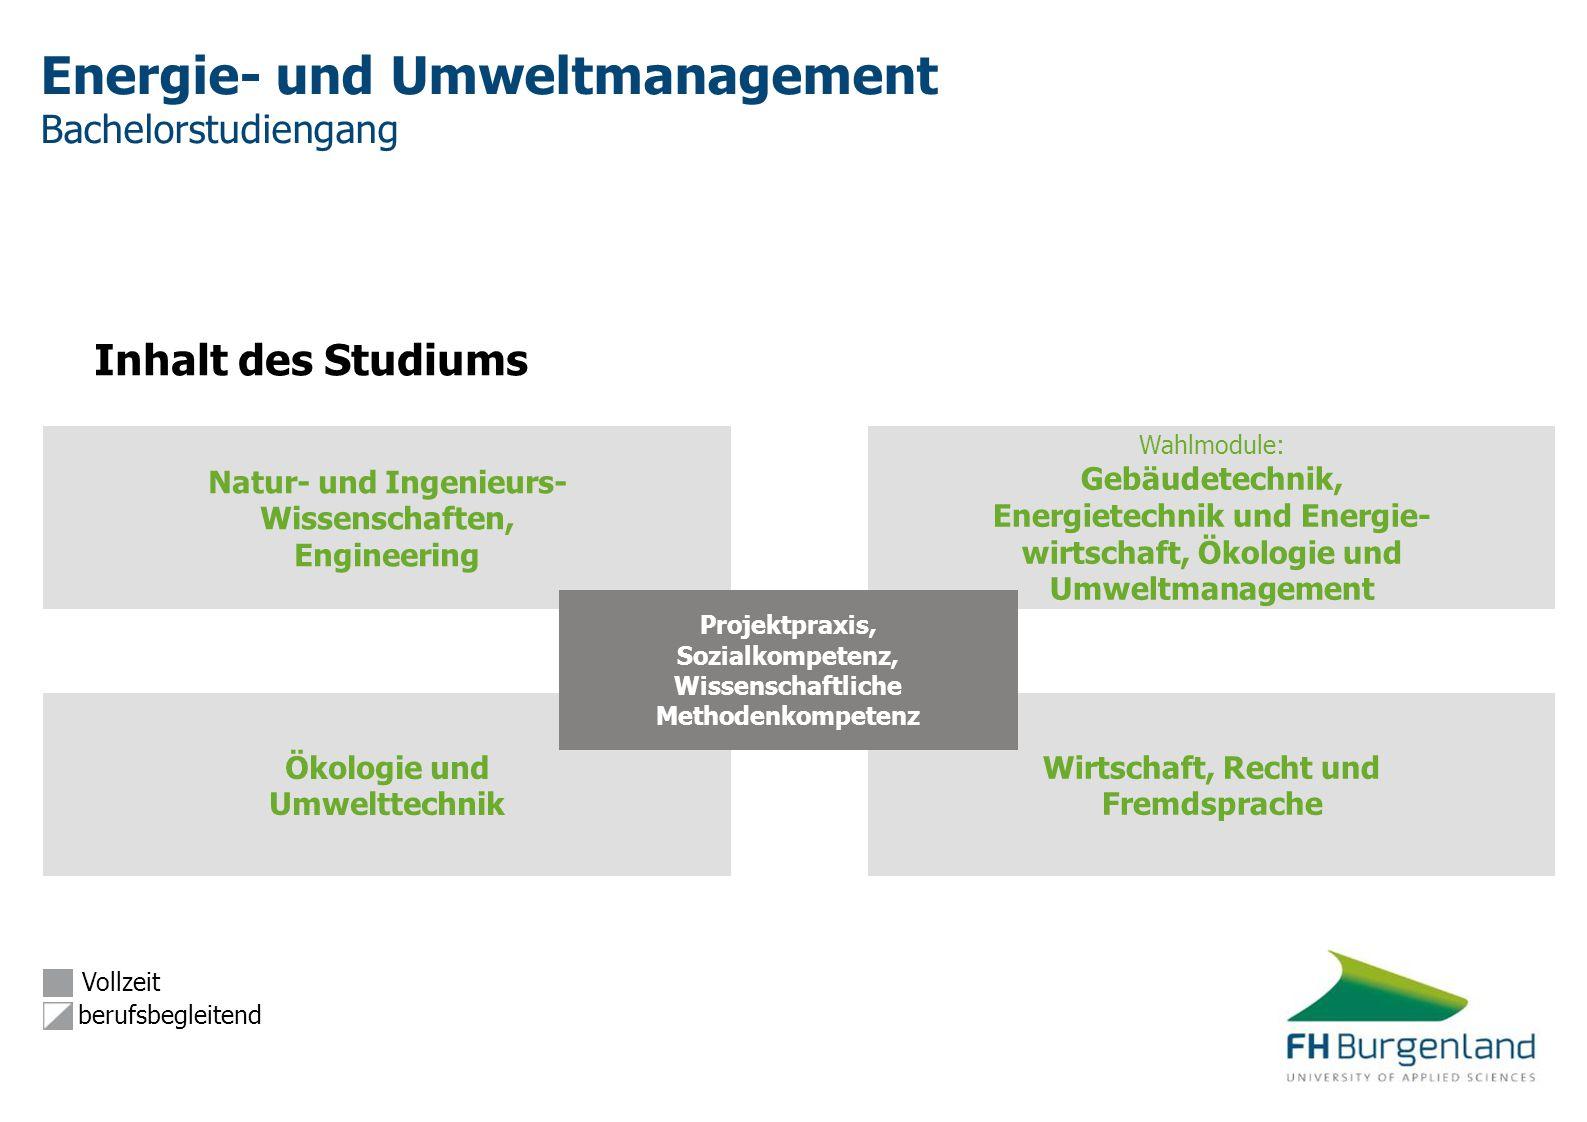 Energie- und Umweltmanagement Bachelorstudiengang